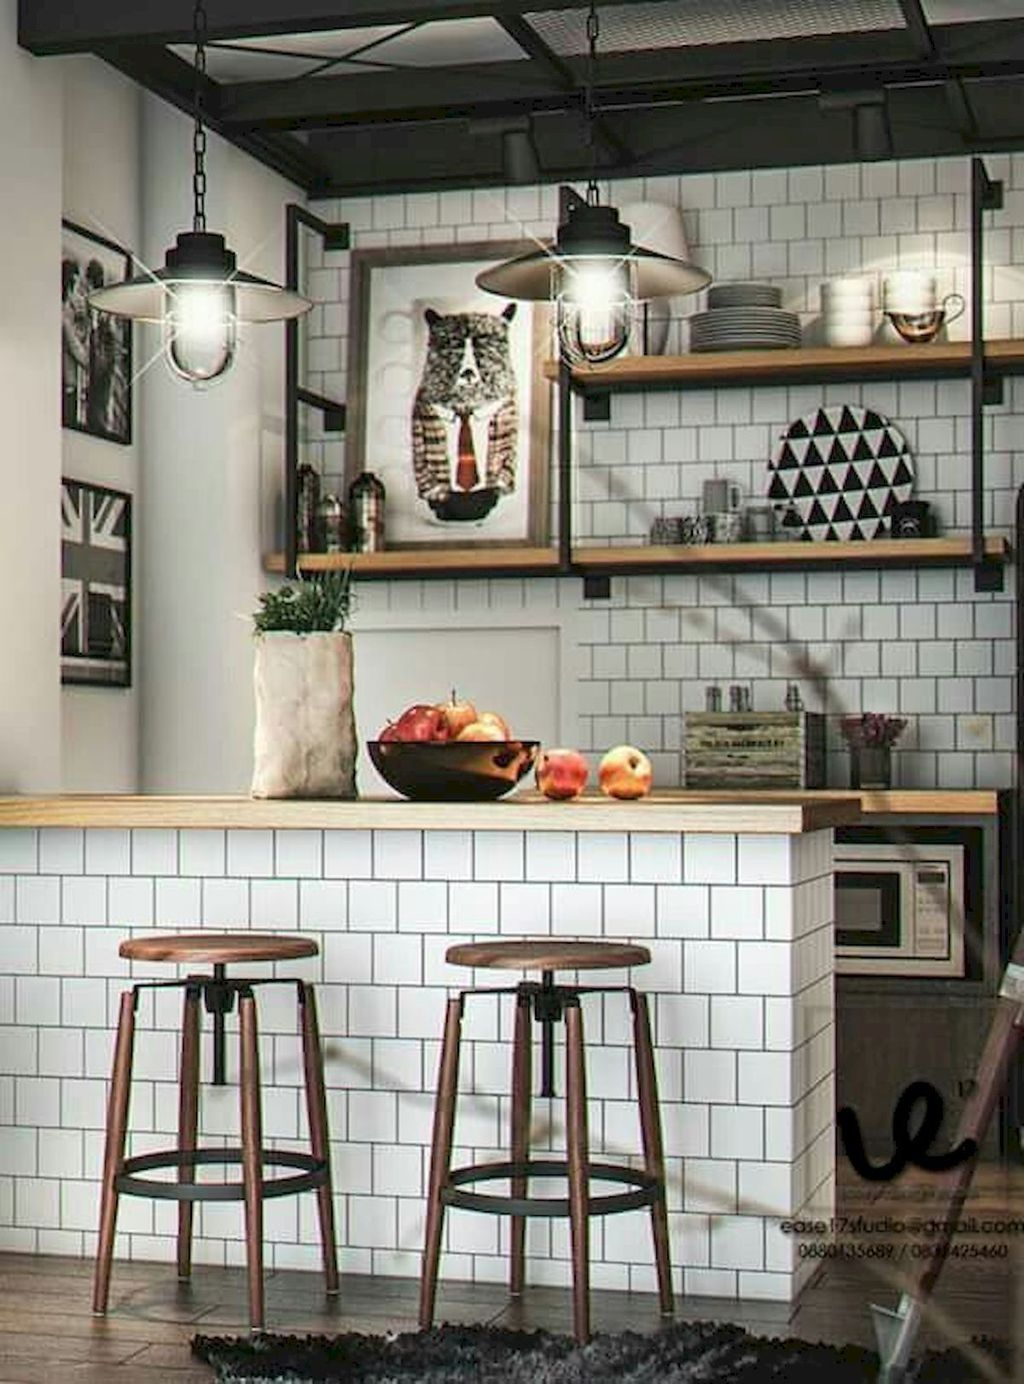 Small Kitchen Design 10x10: 32 Stunning Small Kitchen Design Ideas